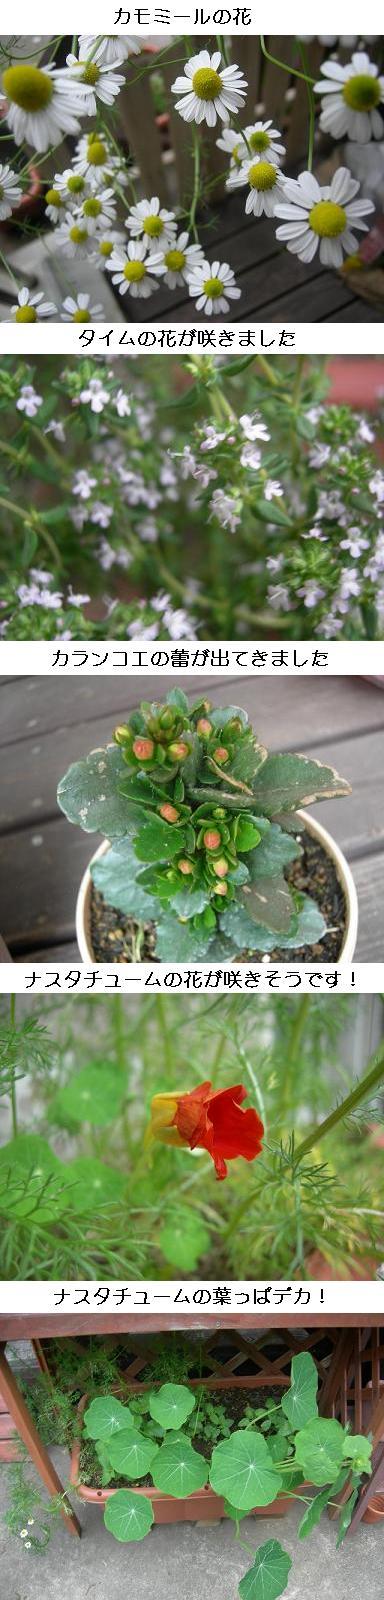 20080504hana.jpg